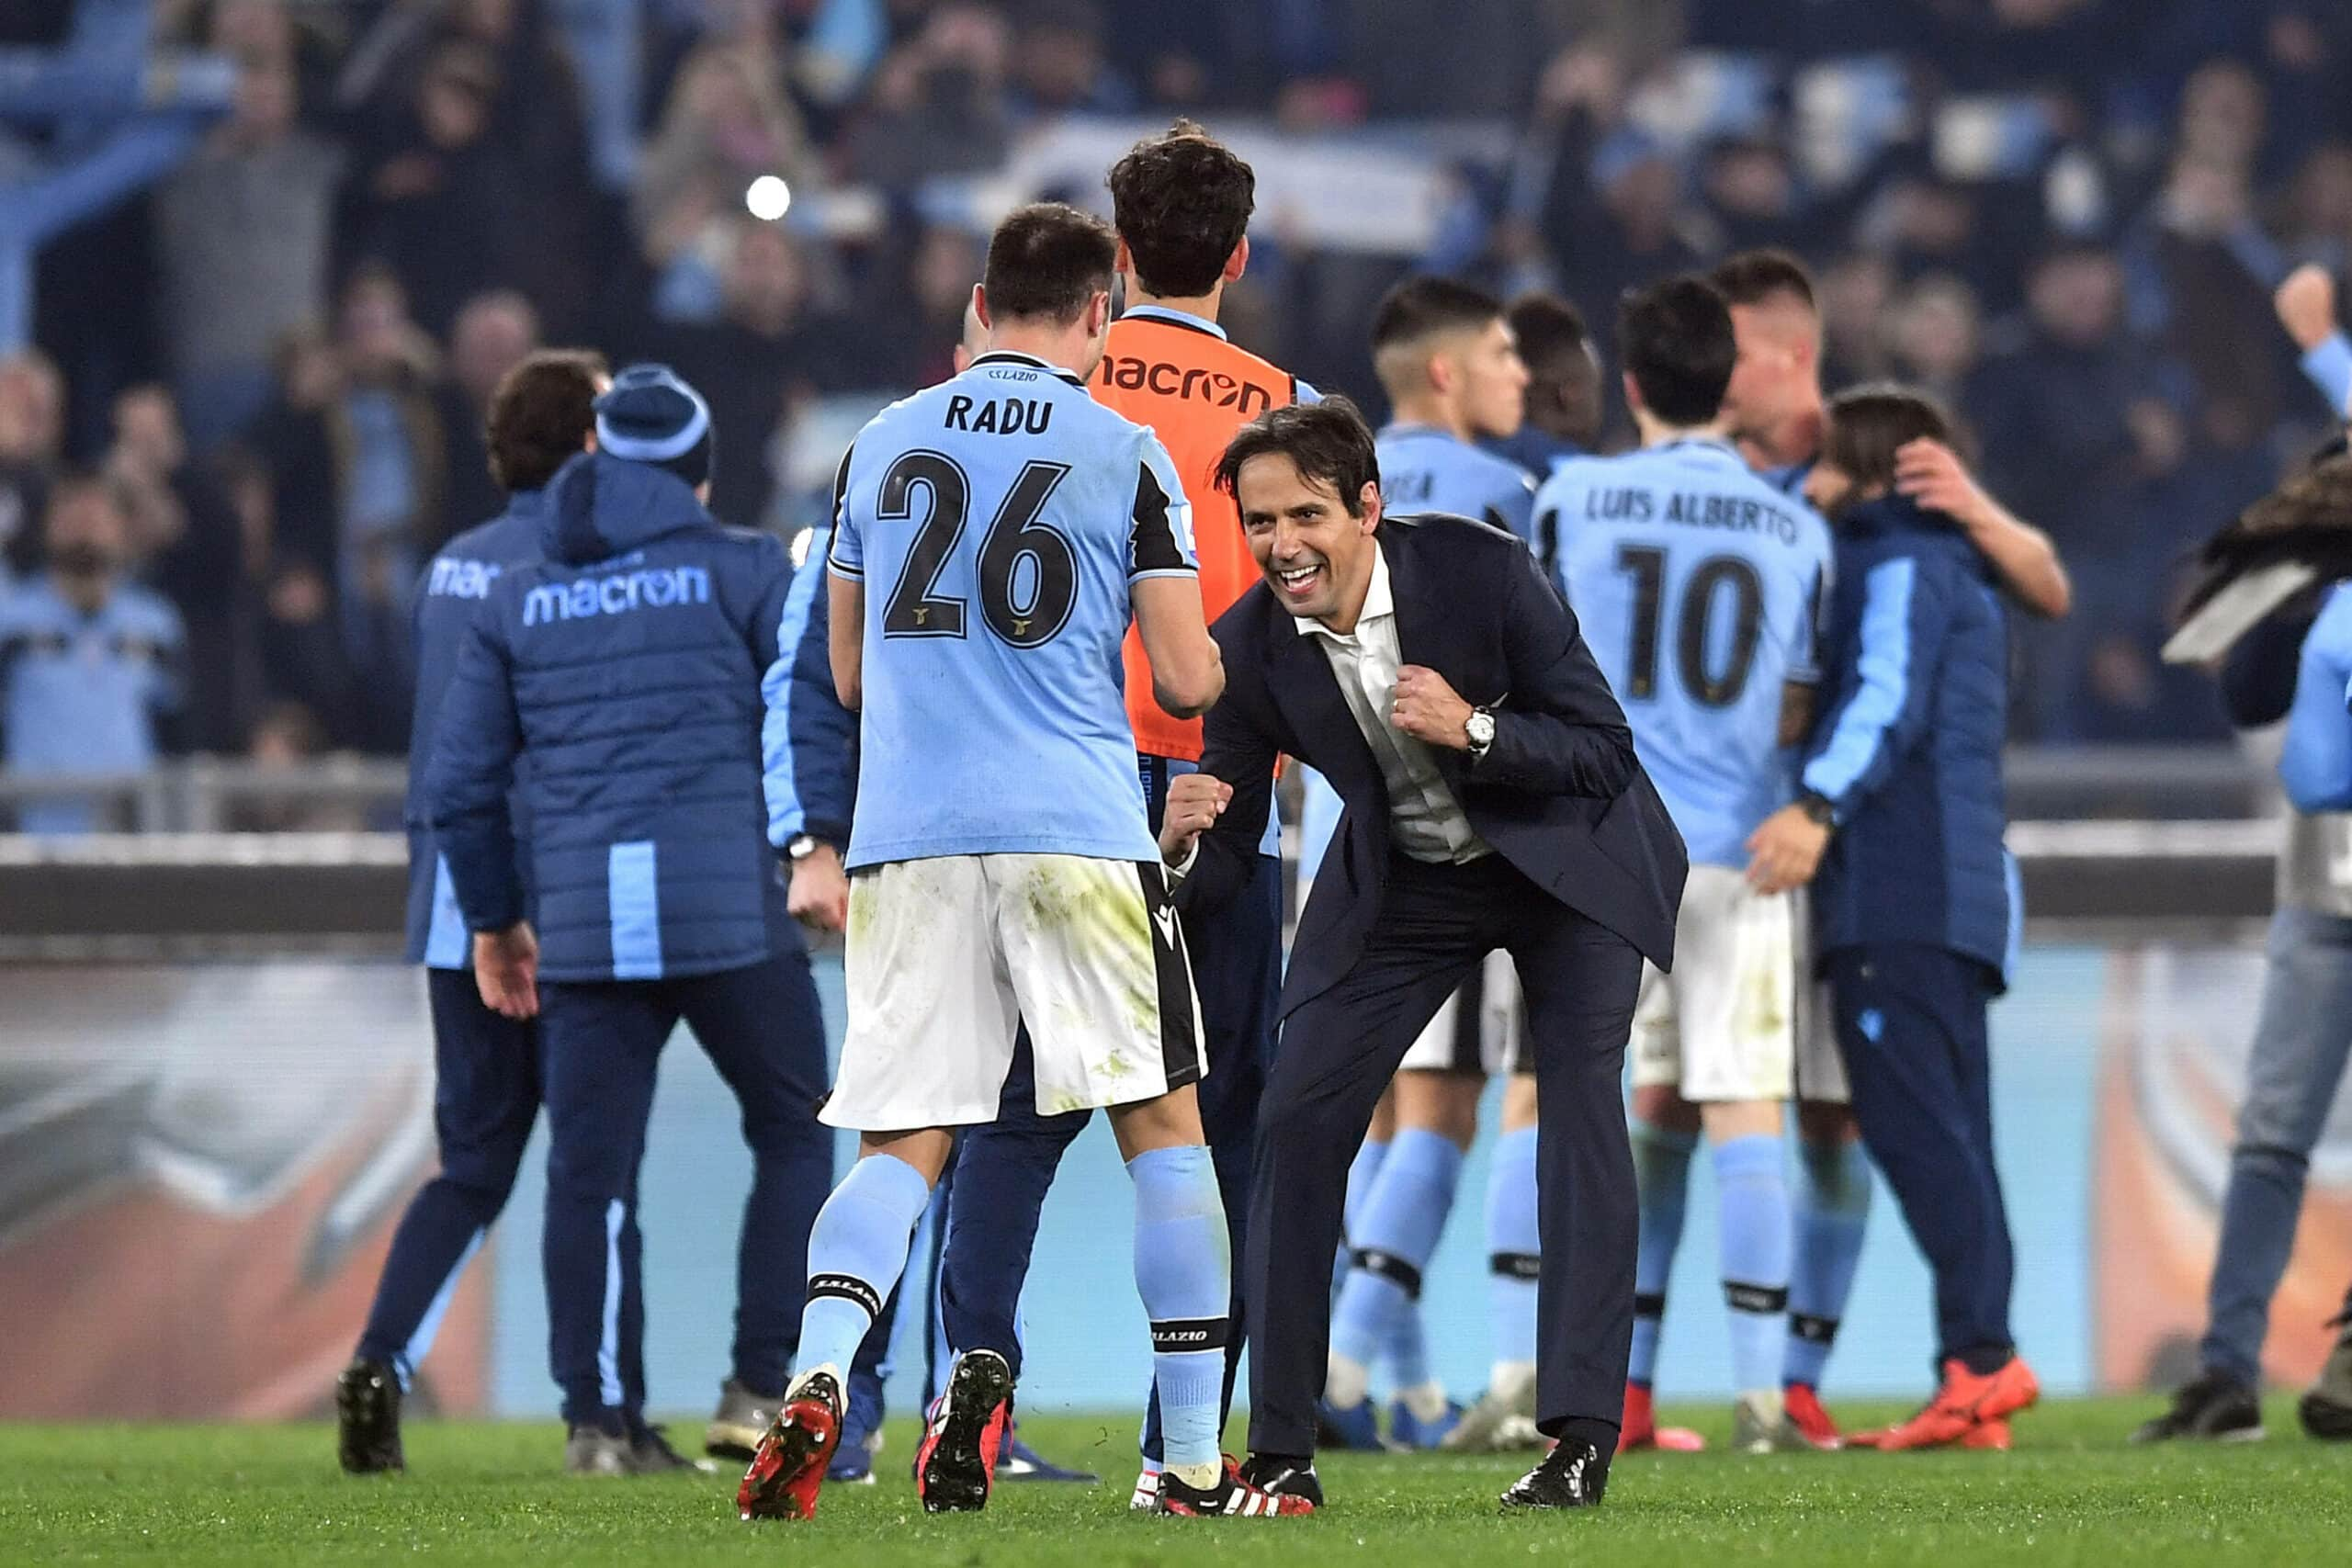 Inter Radu Inzaghi Lazio